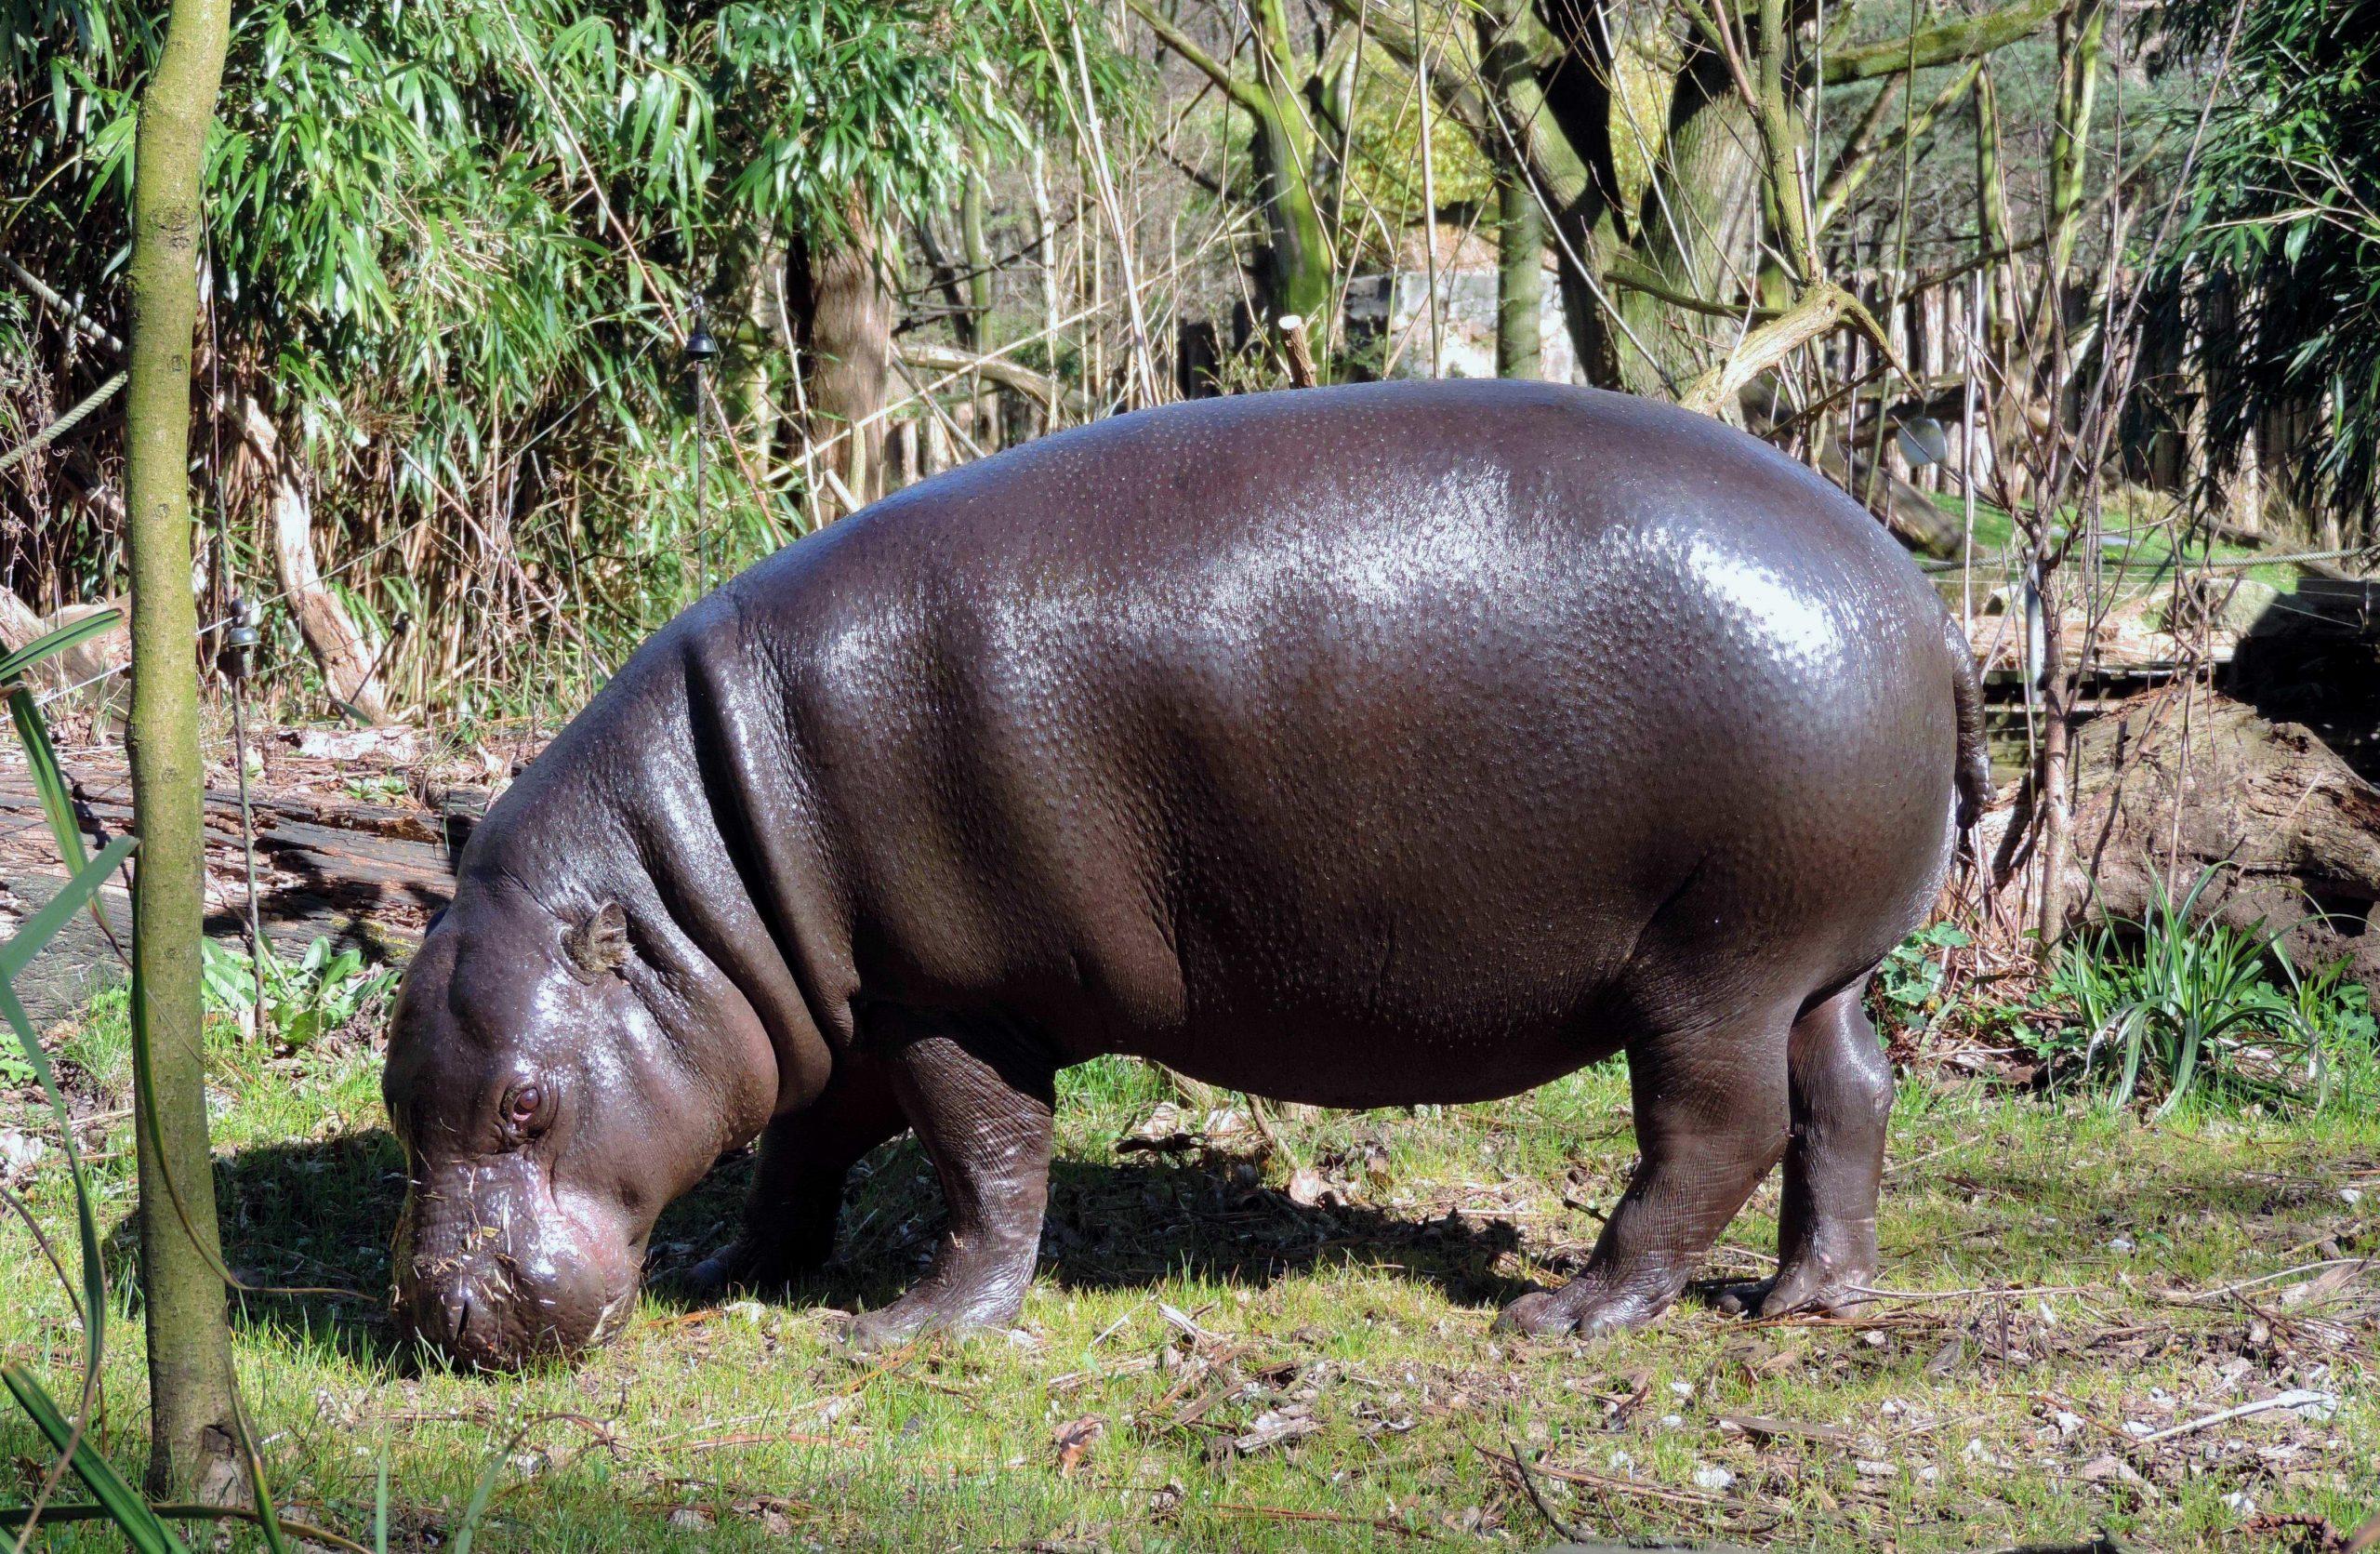 Skin deep: When mammals re-entered water